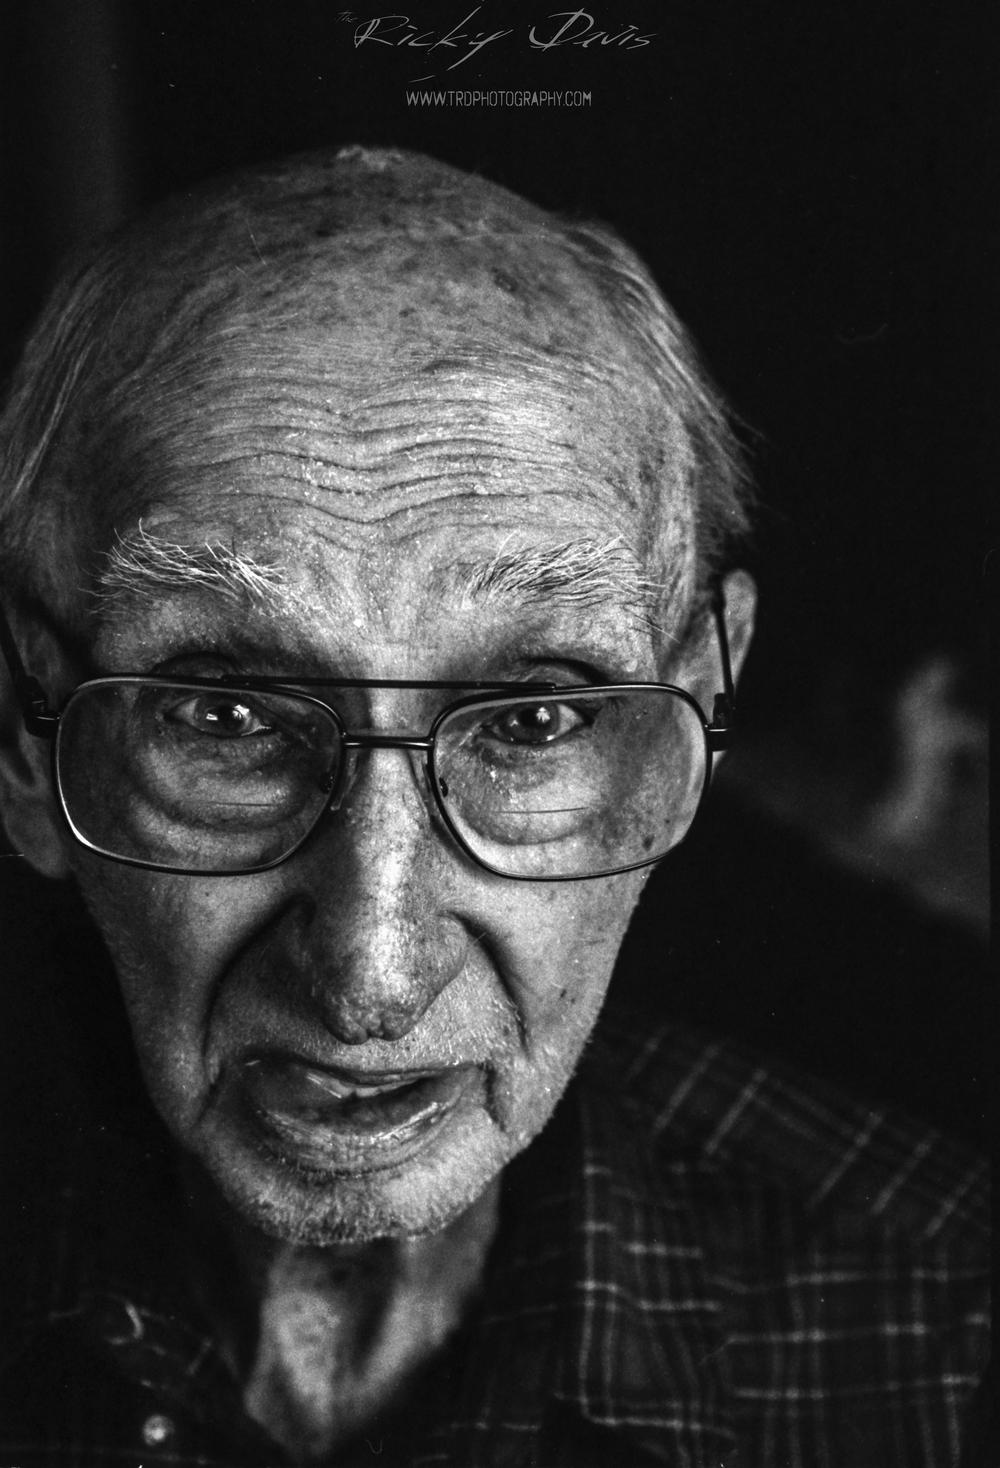 WWII Veteran - Army - Pvt Charles E. Miller - TRD Photography - Film - Kodak Tri X